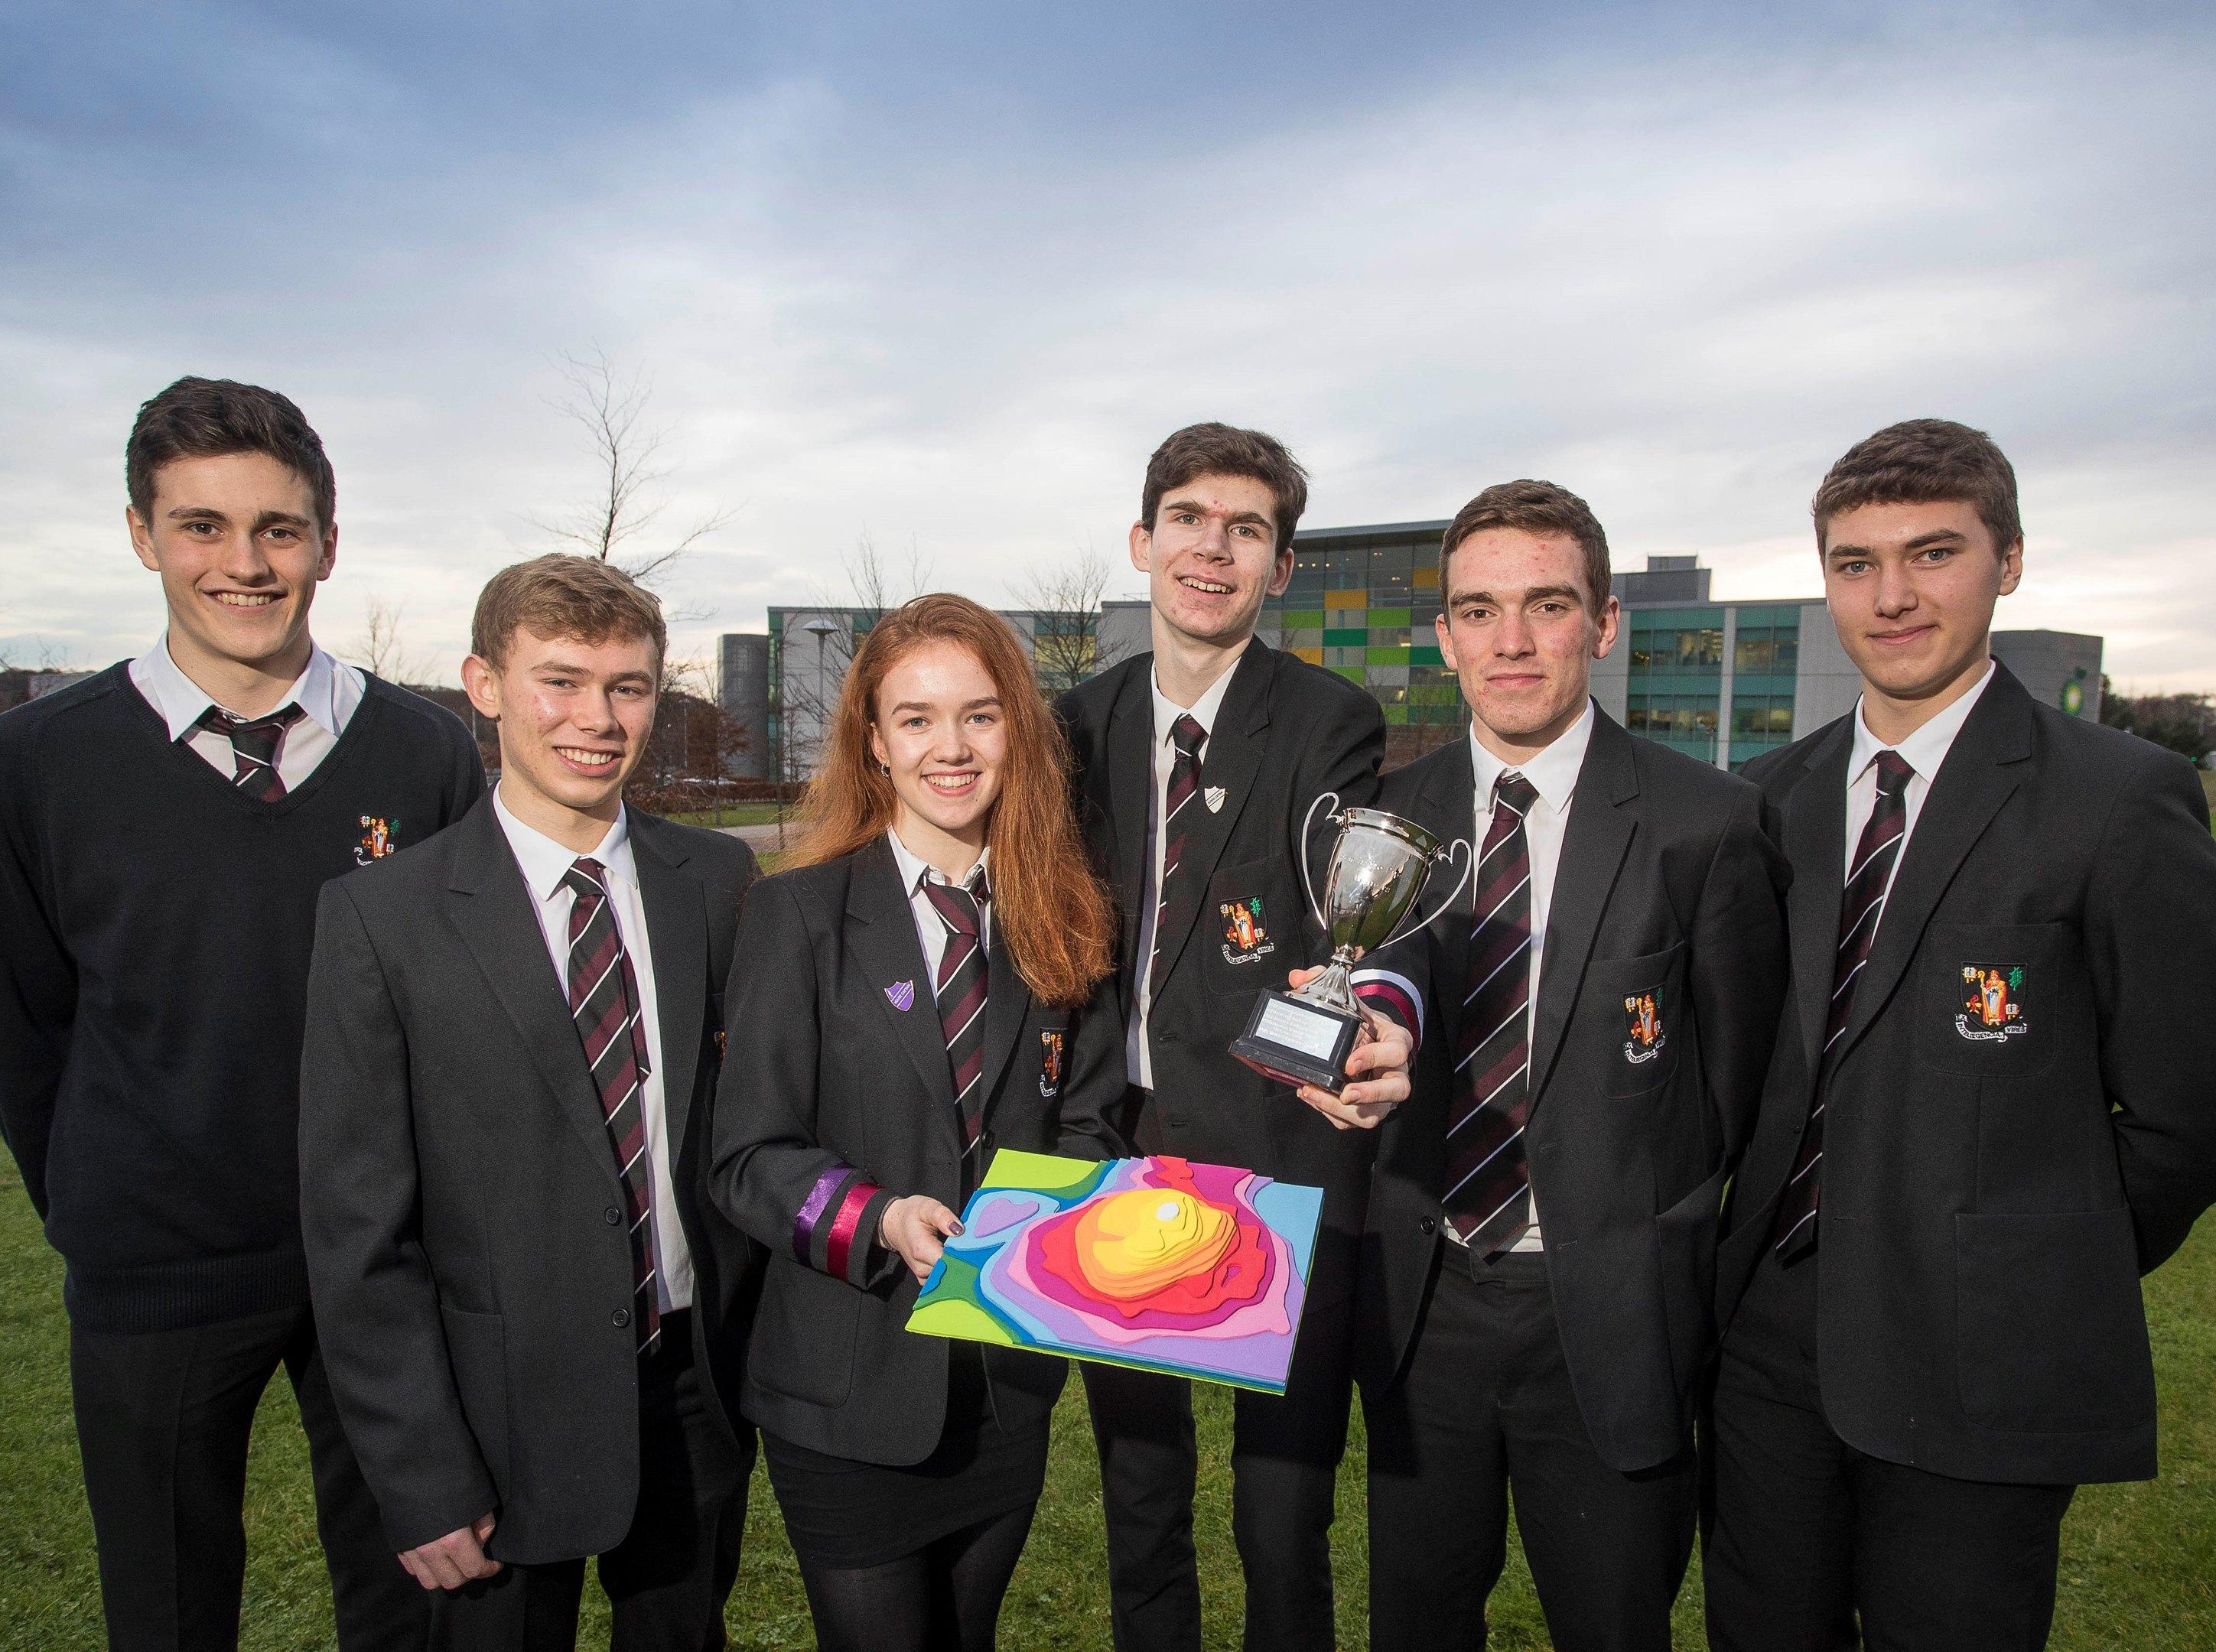 Ben Strachan (17), Daniel Birch (18), Lauren Liversidge (17), Kazio Wilowski (16), Jack Banfield (17) and Danny Skinner (16).